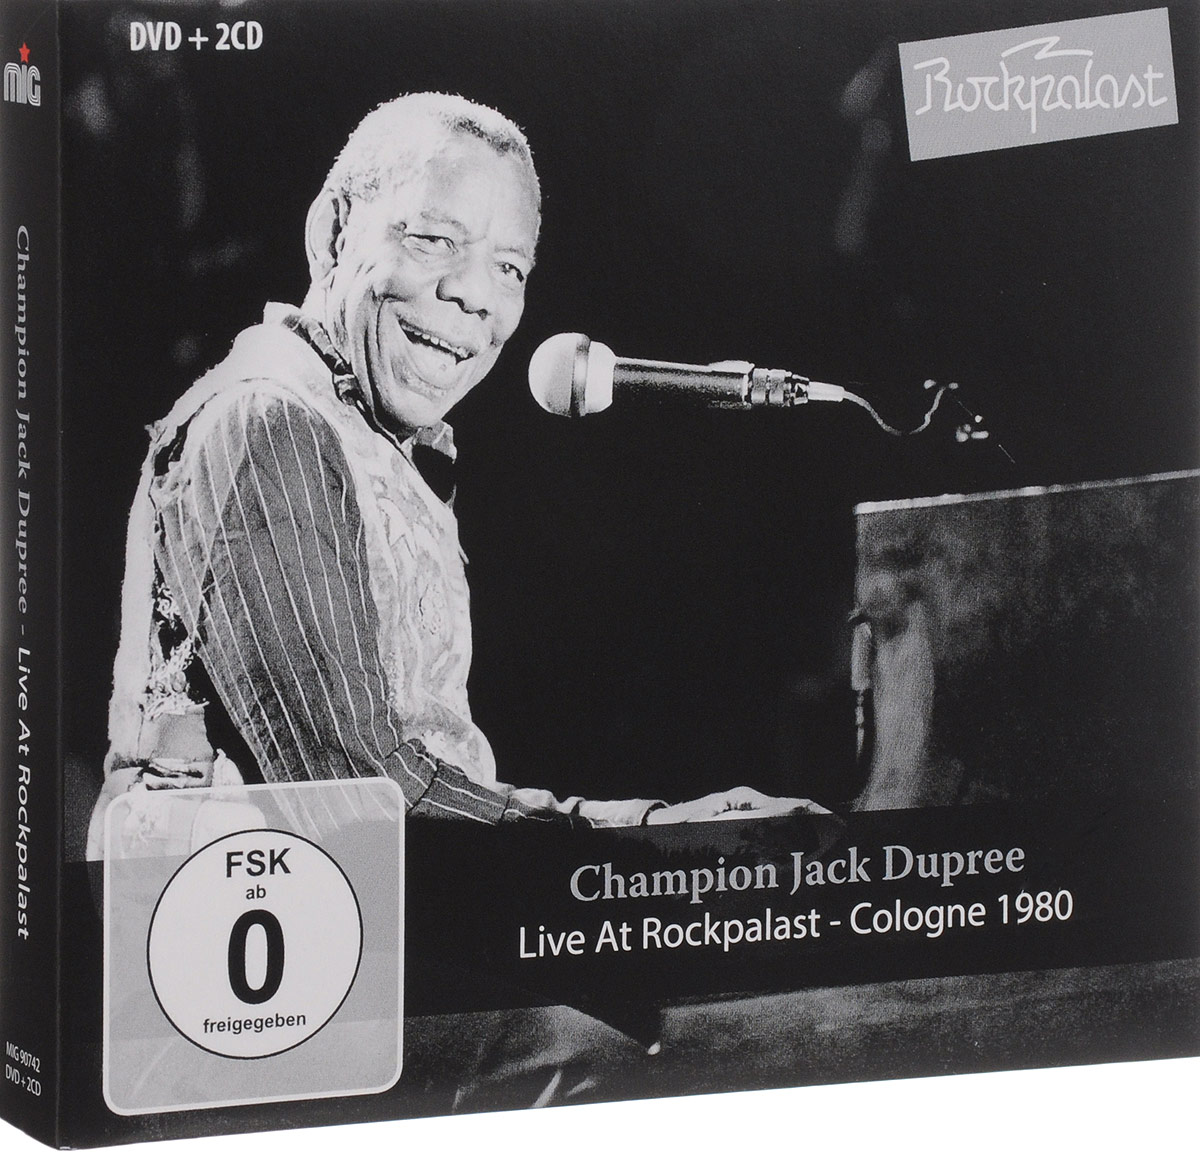 Champion Jack Dupree: Live At Rockpalast (DVD + 2 CD) mother s finest live at rockpalast dvd 2 cd